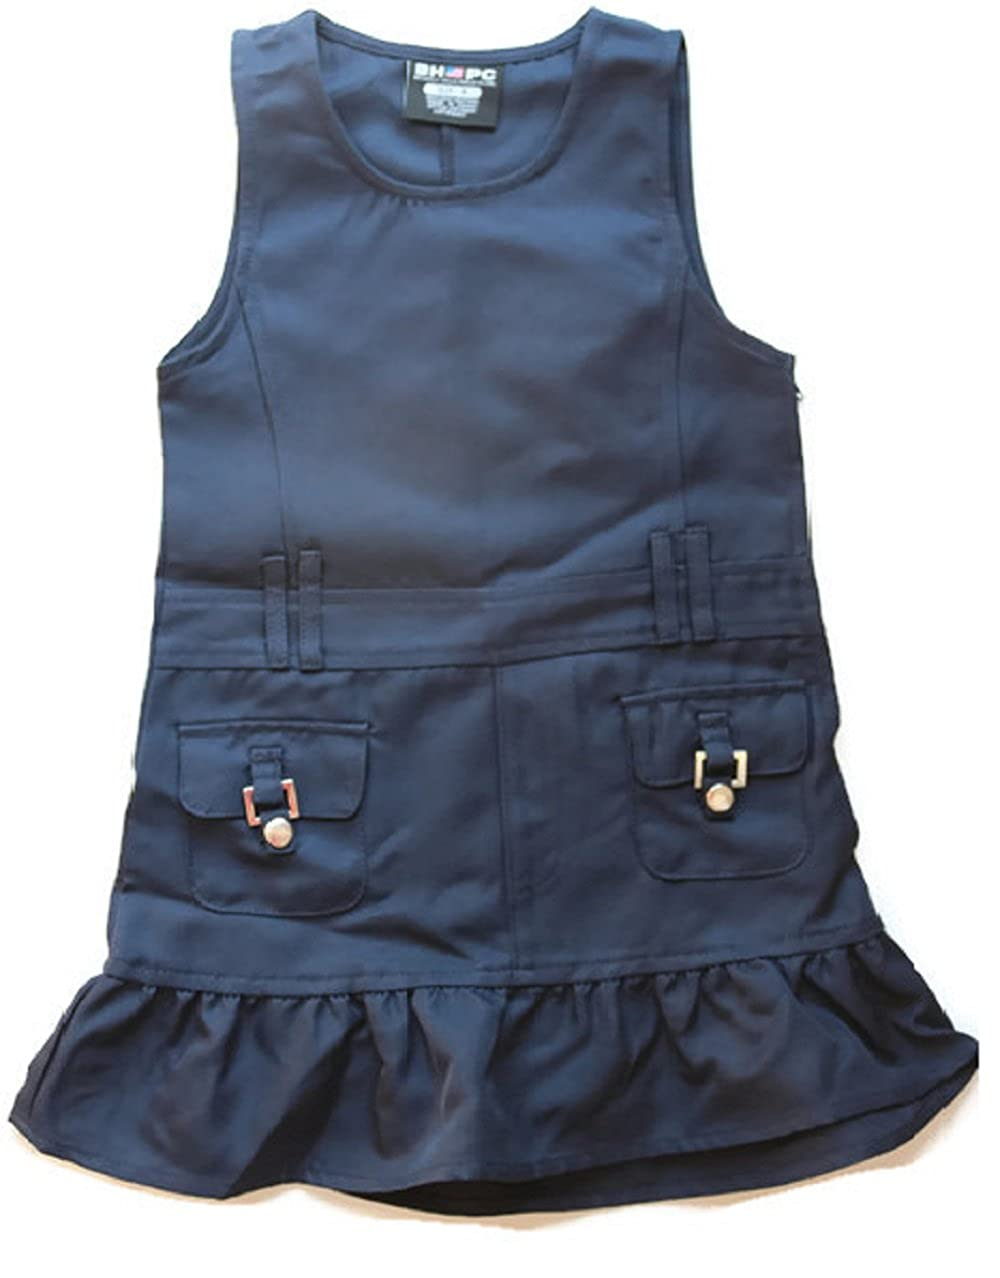 FGR Polo Club 2 Snap Front Pocket Twill School Jumper